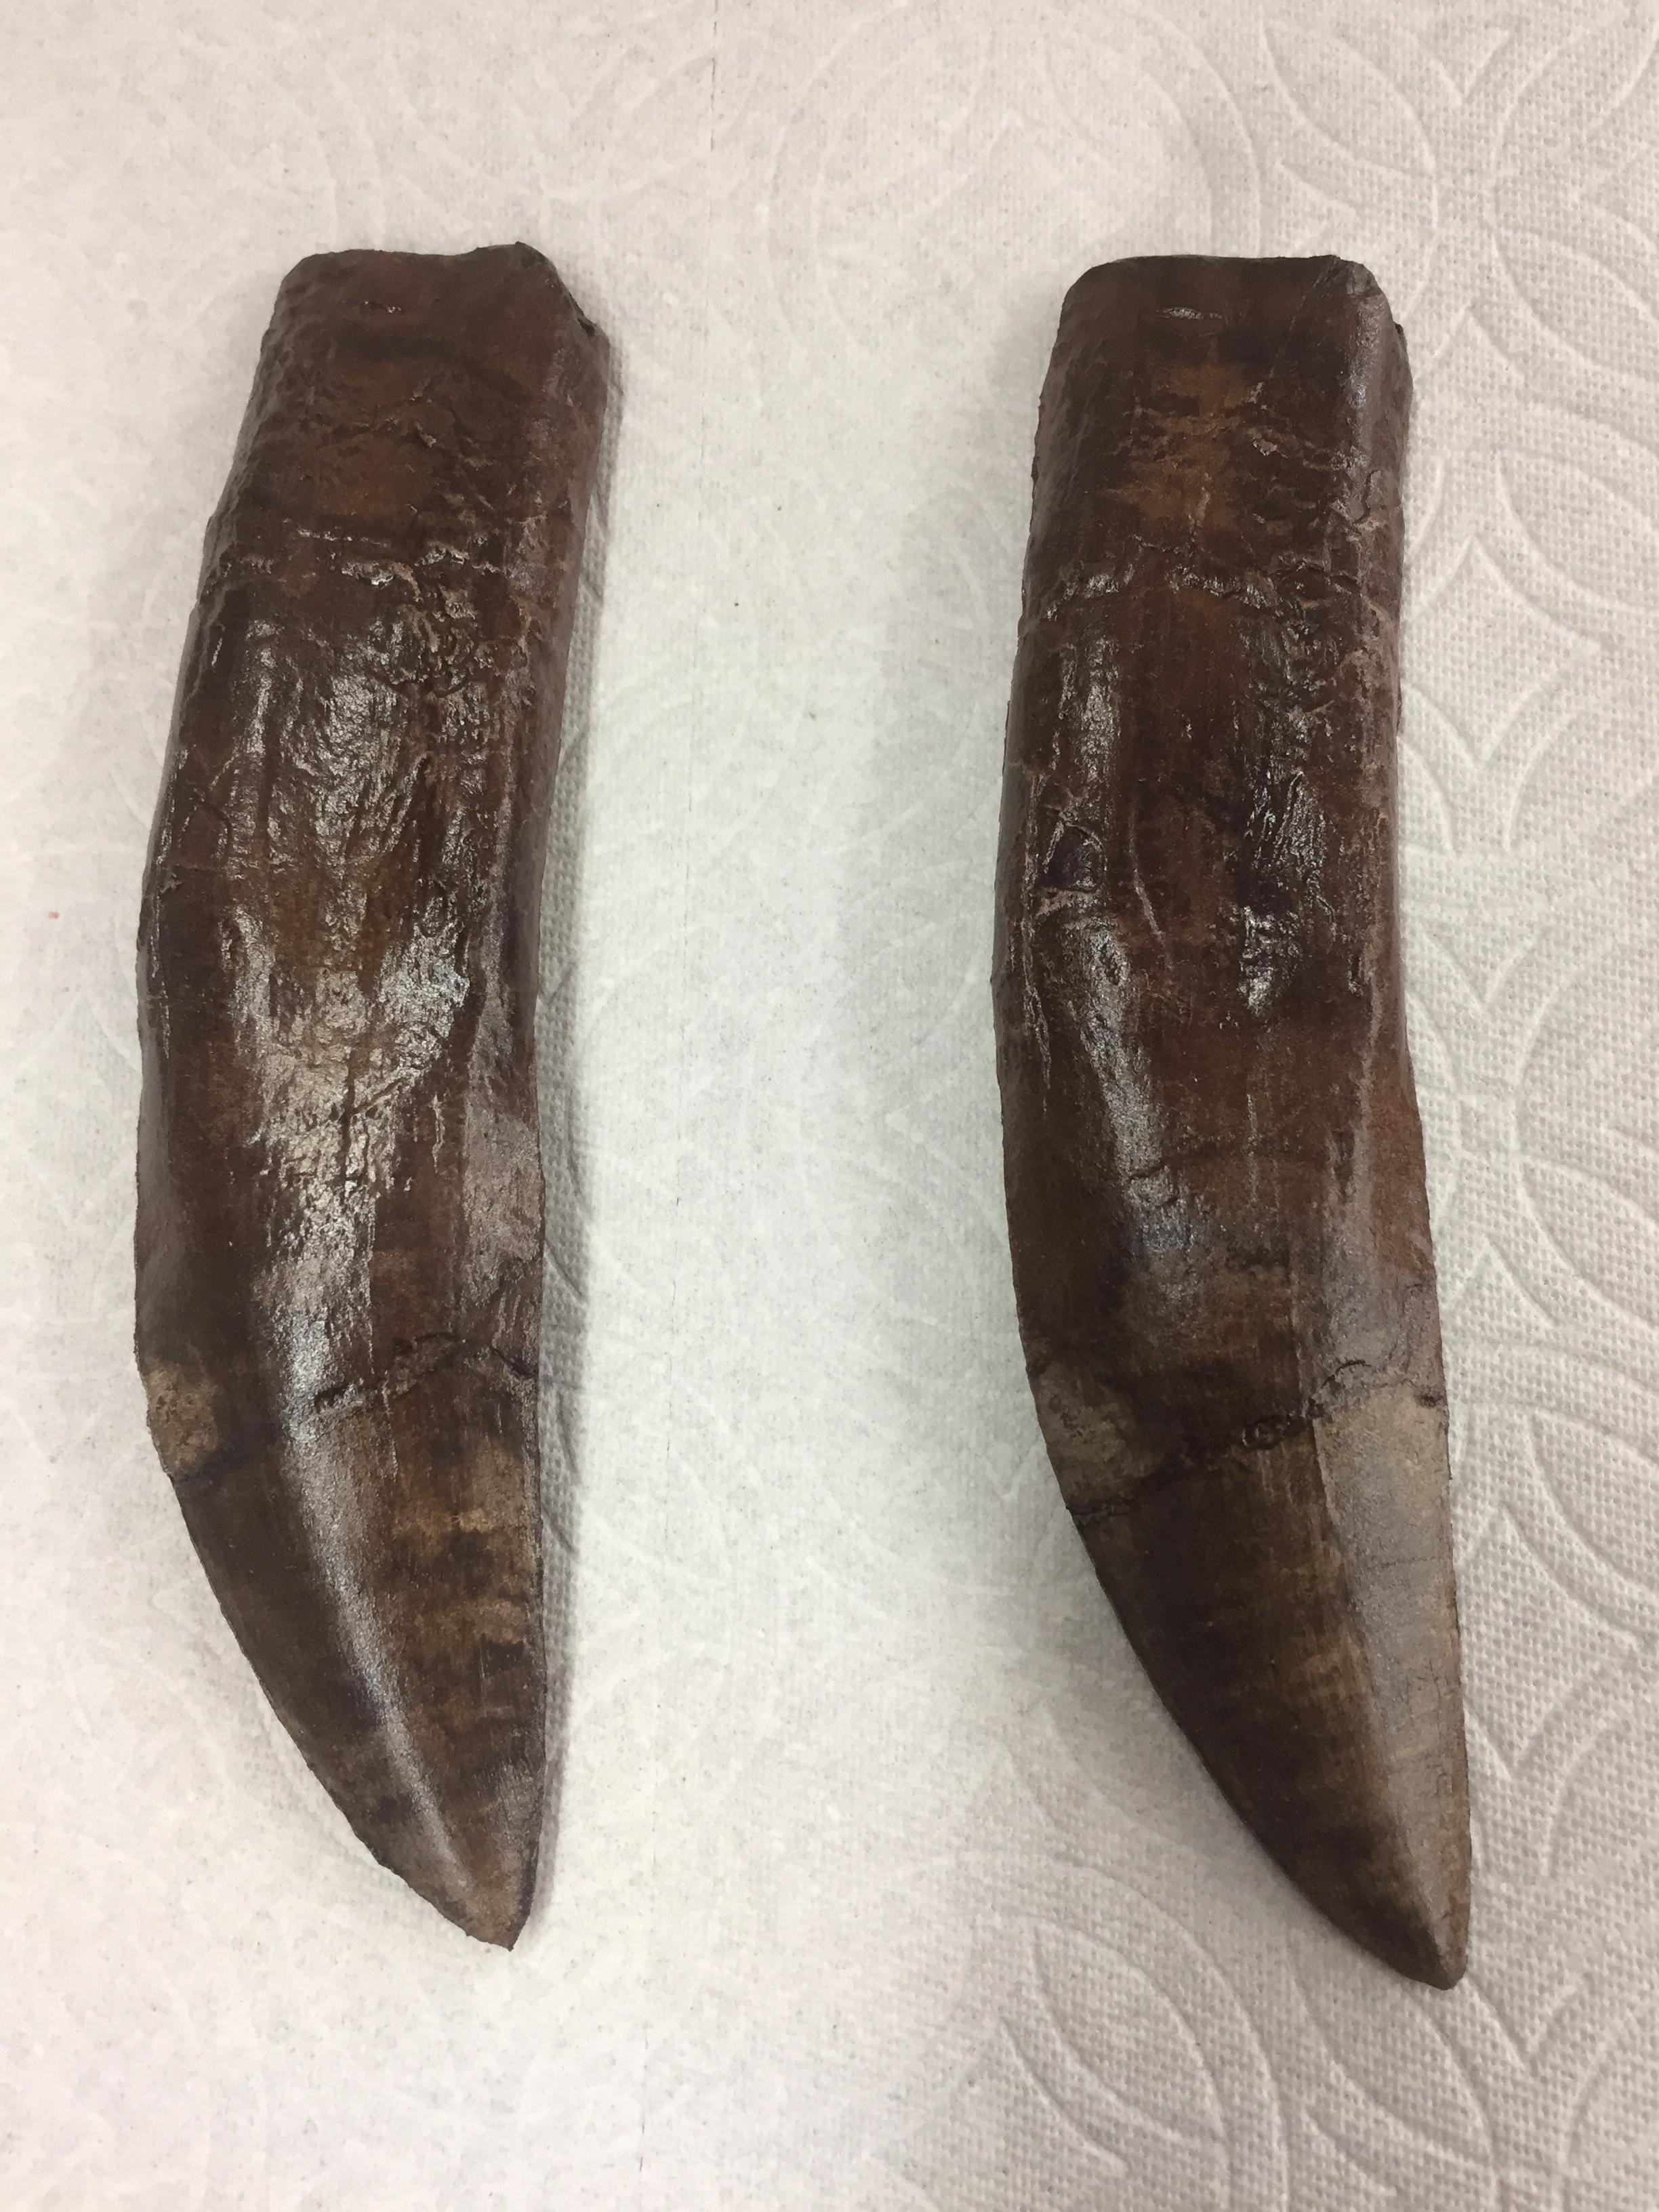 Foam Rubber Dinosaur Teeth